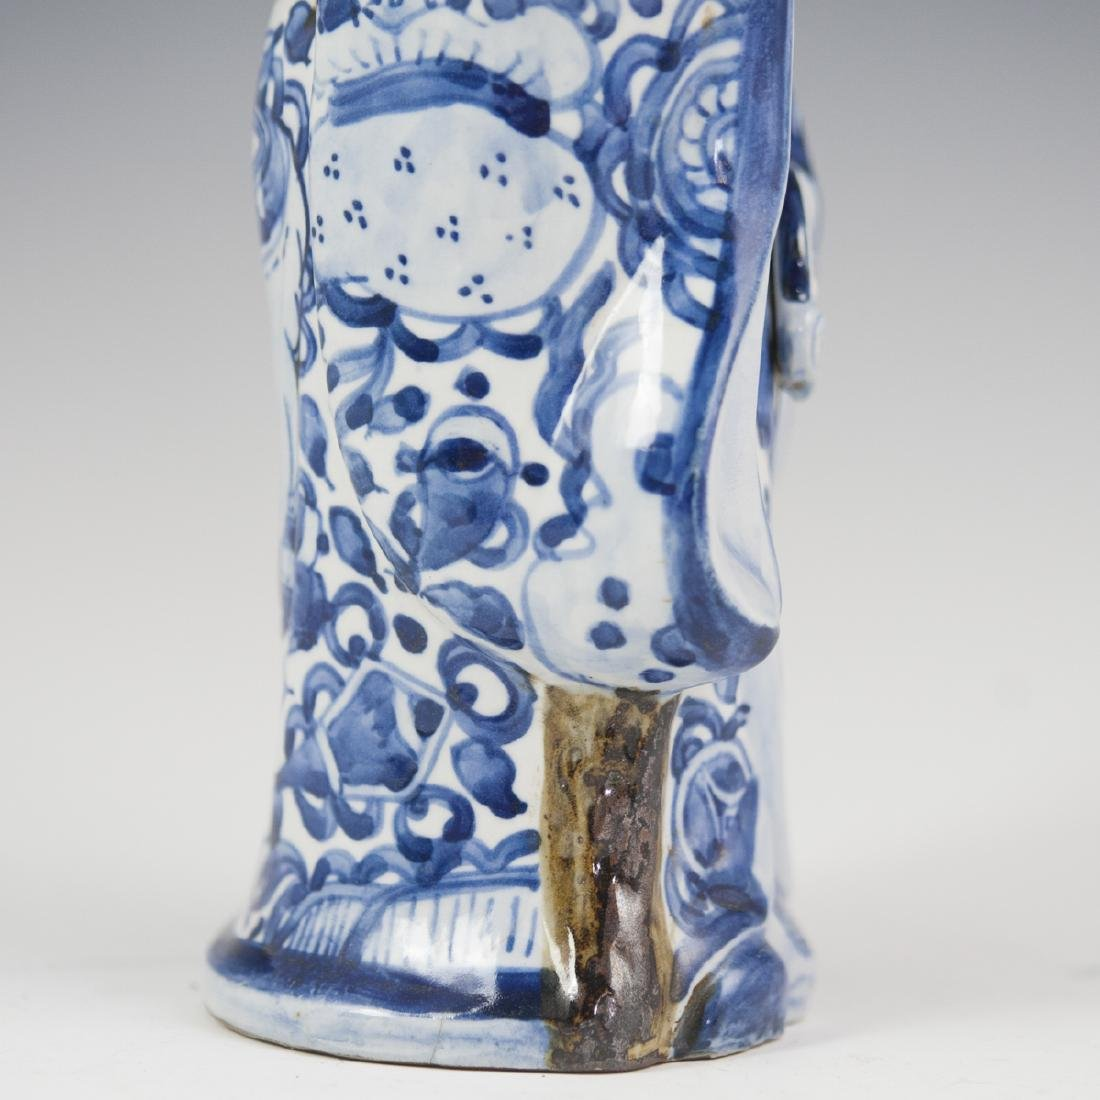 Chinese Glazed Pottery Shou Xing Figurine - 7